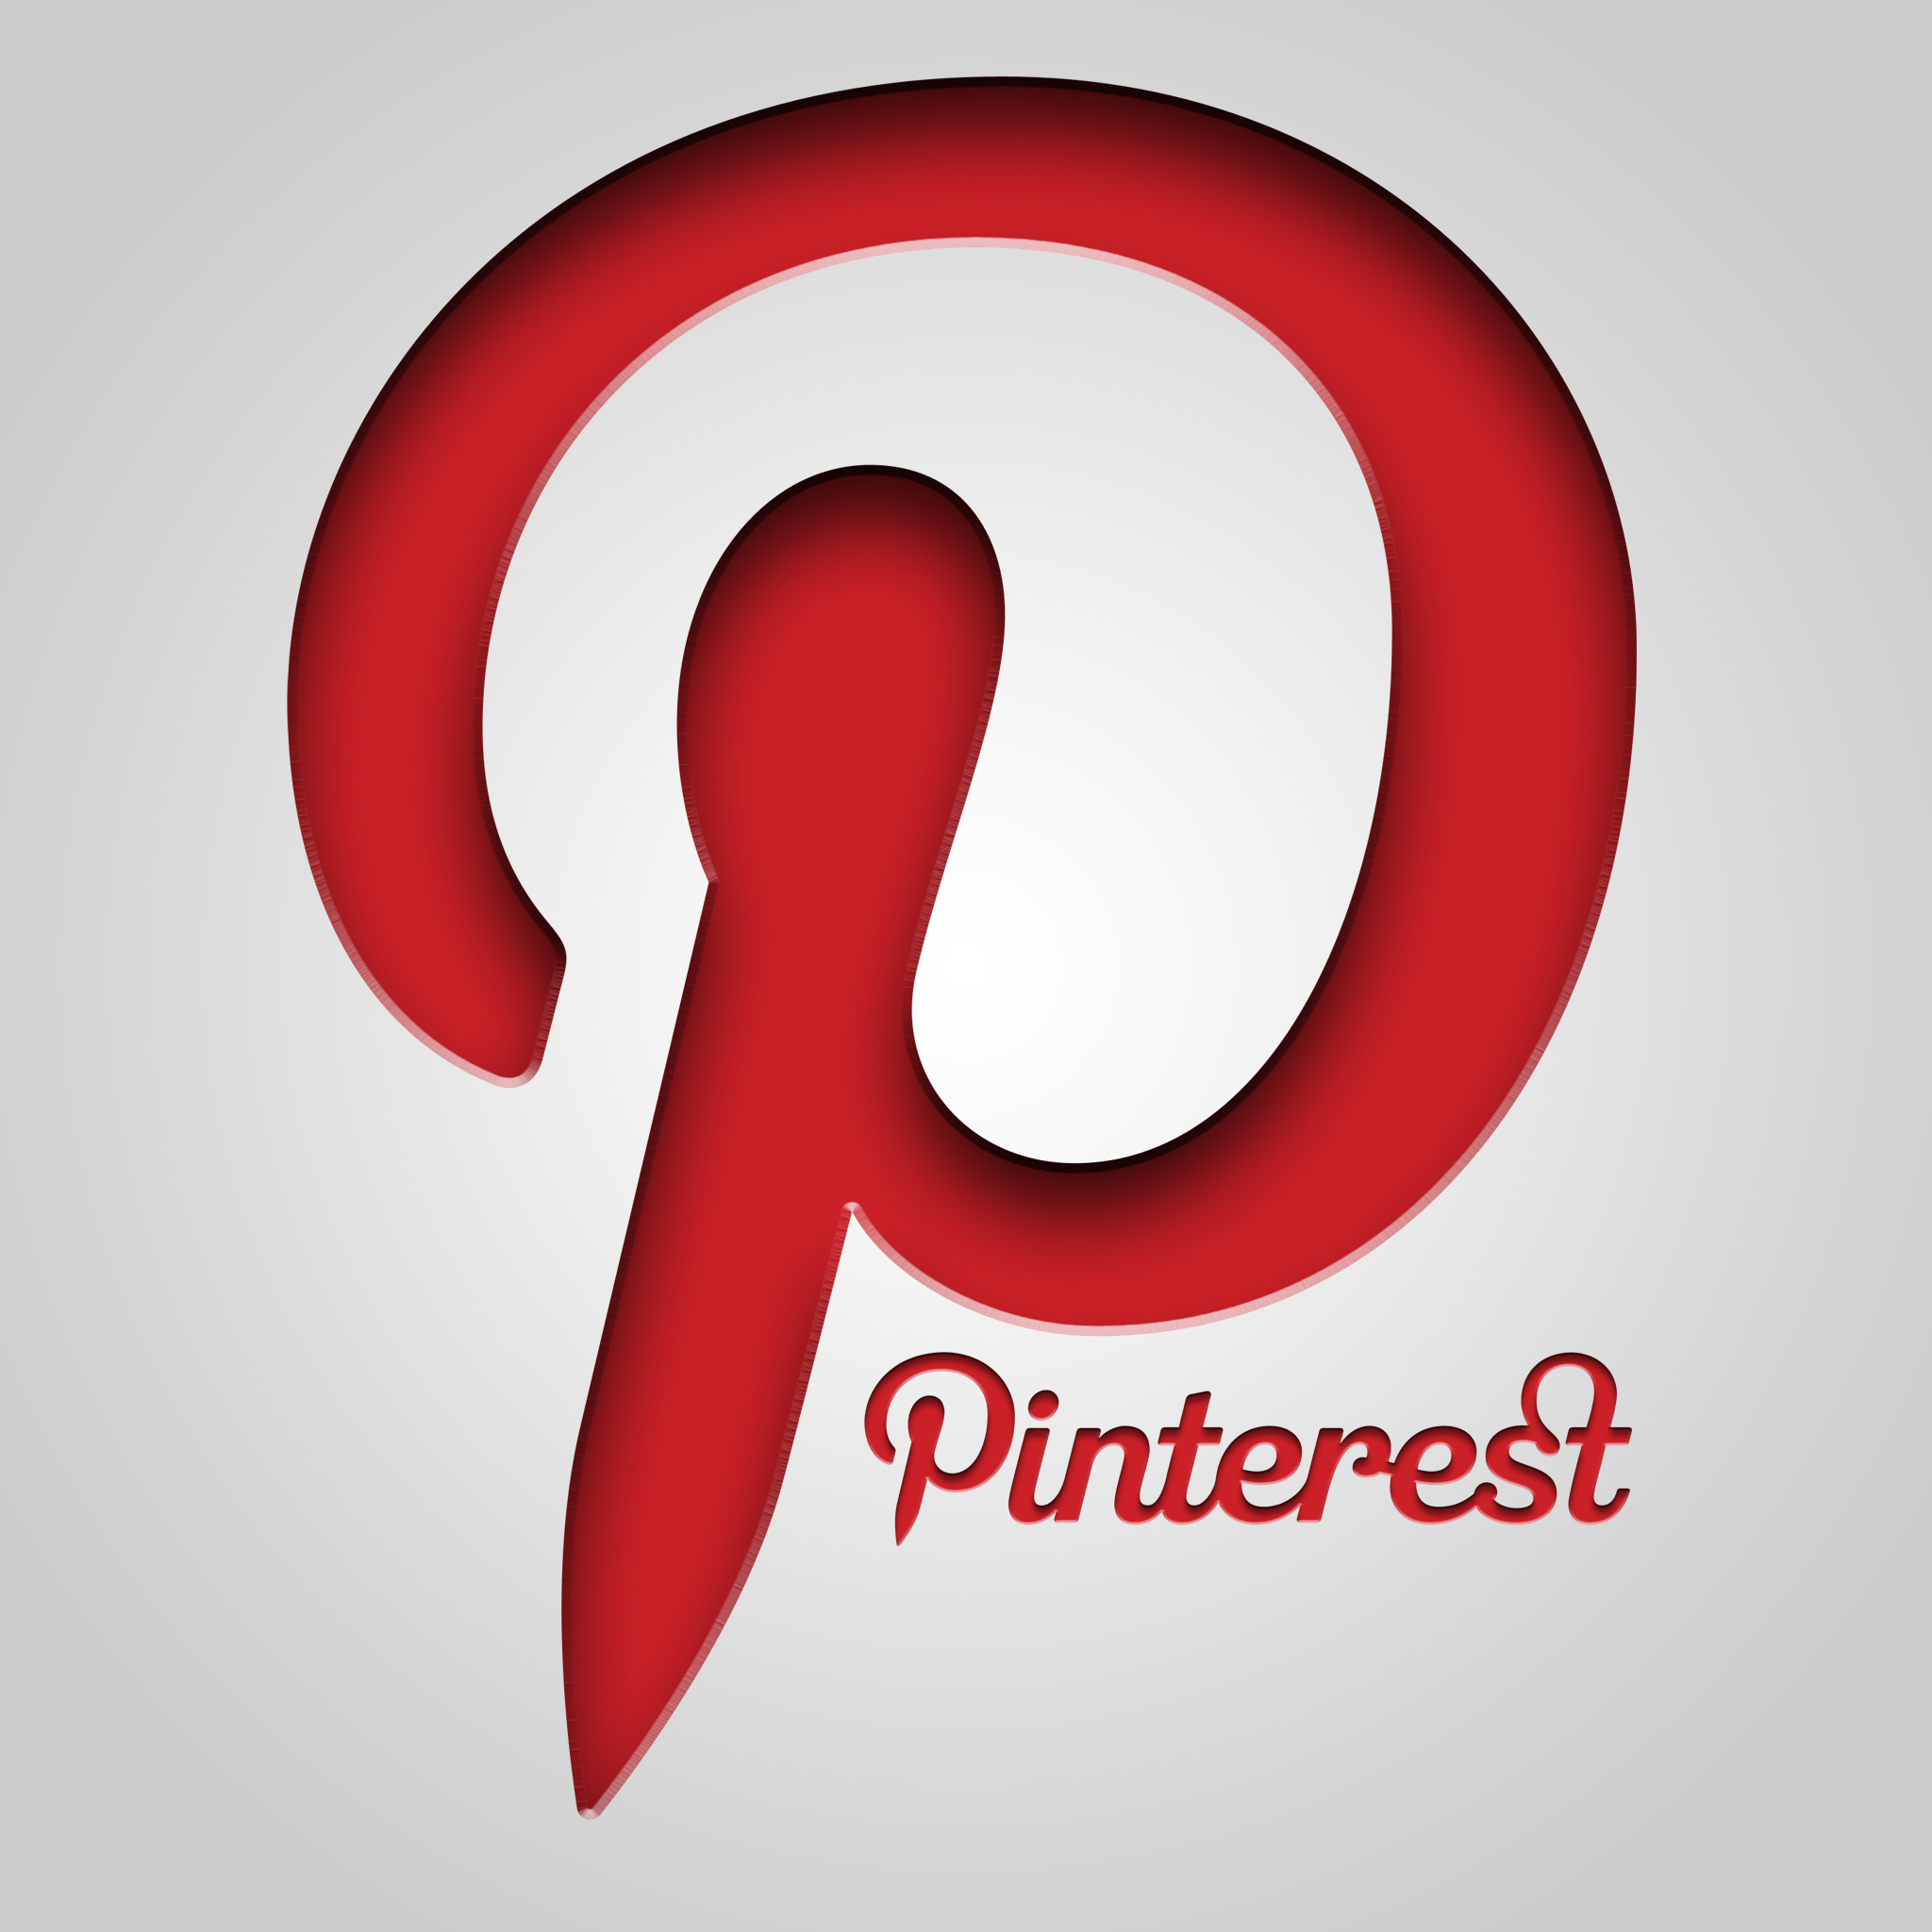 pinterest keeps on getting better